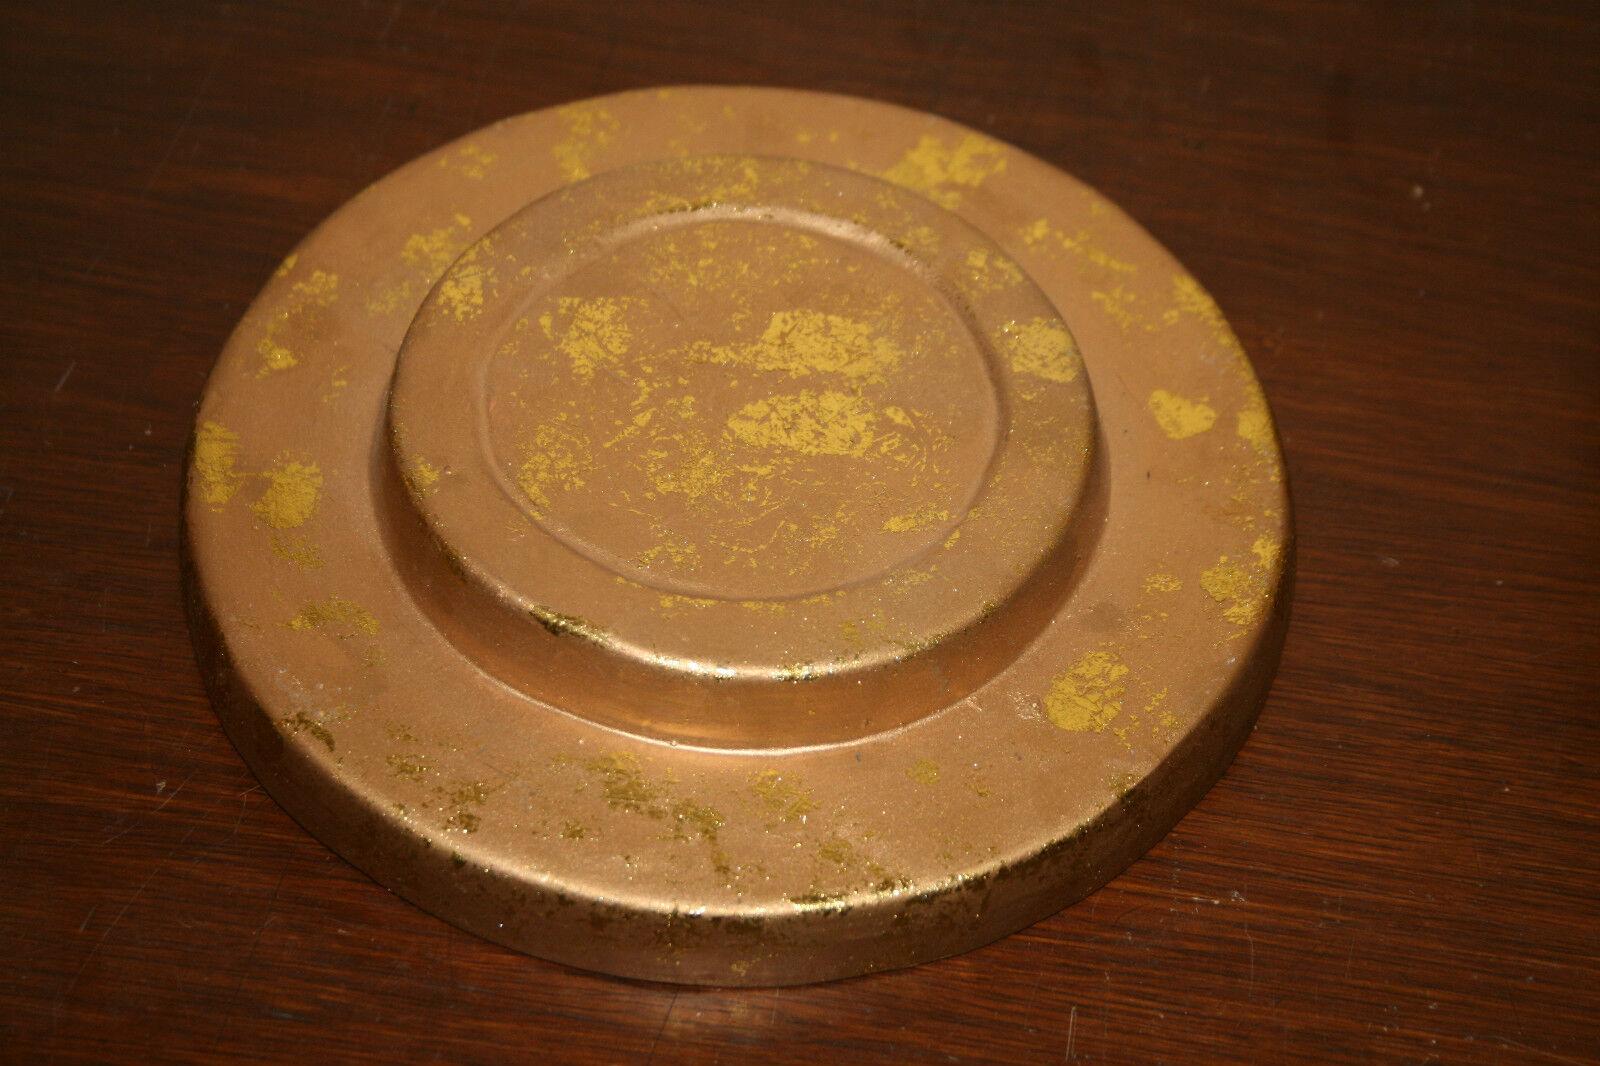 Keramik Kegel Goldfarben zur zur zur Dekoration - Rarität f9a0e8